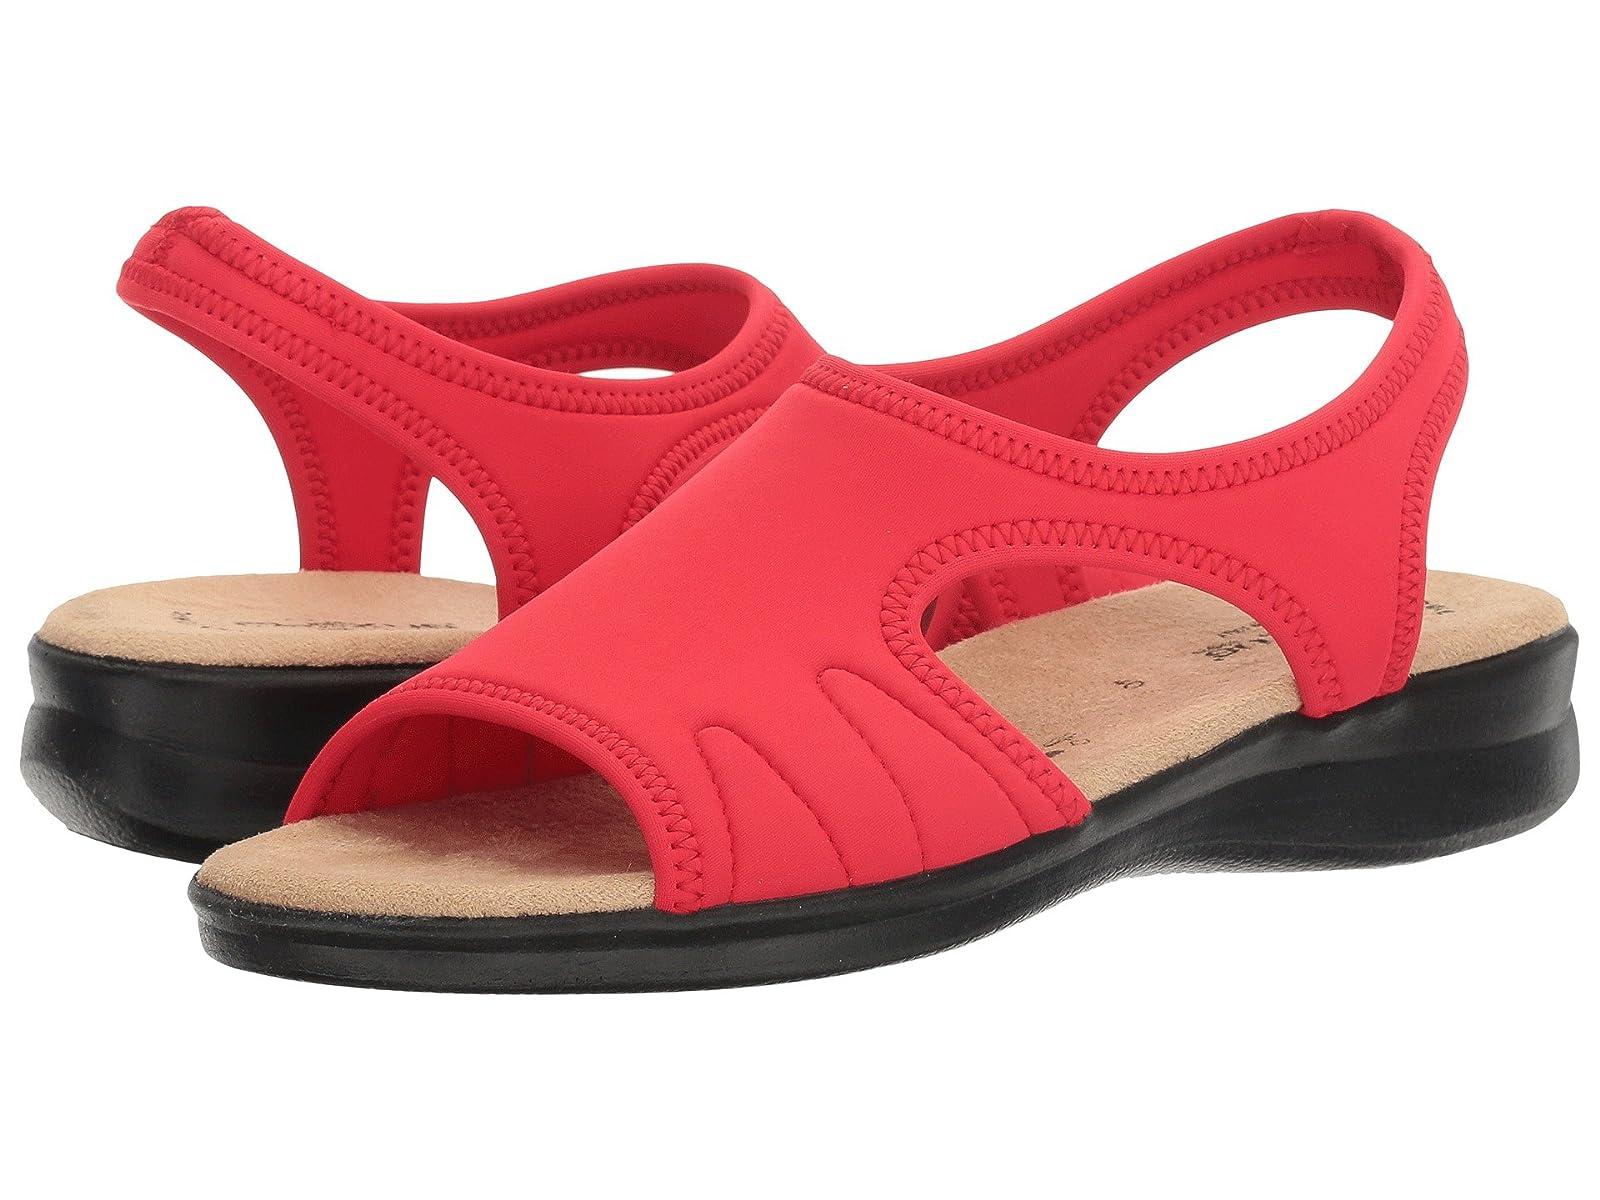 Spring Step NyamanAtmospheric grades have affordable shoes